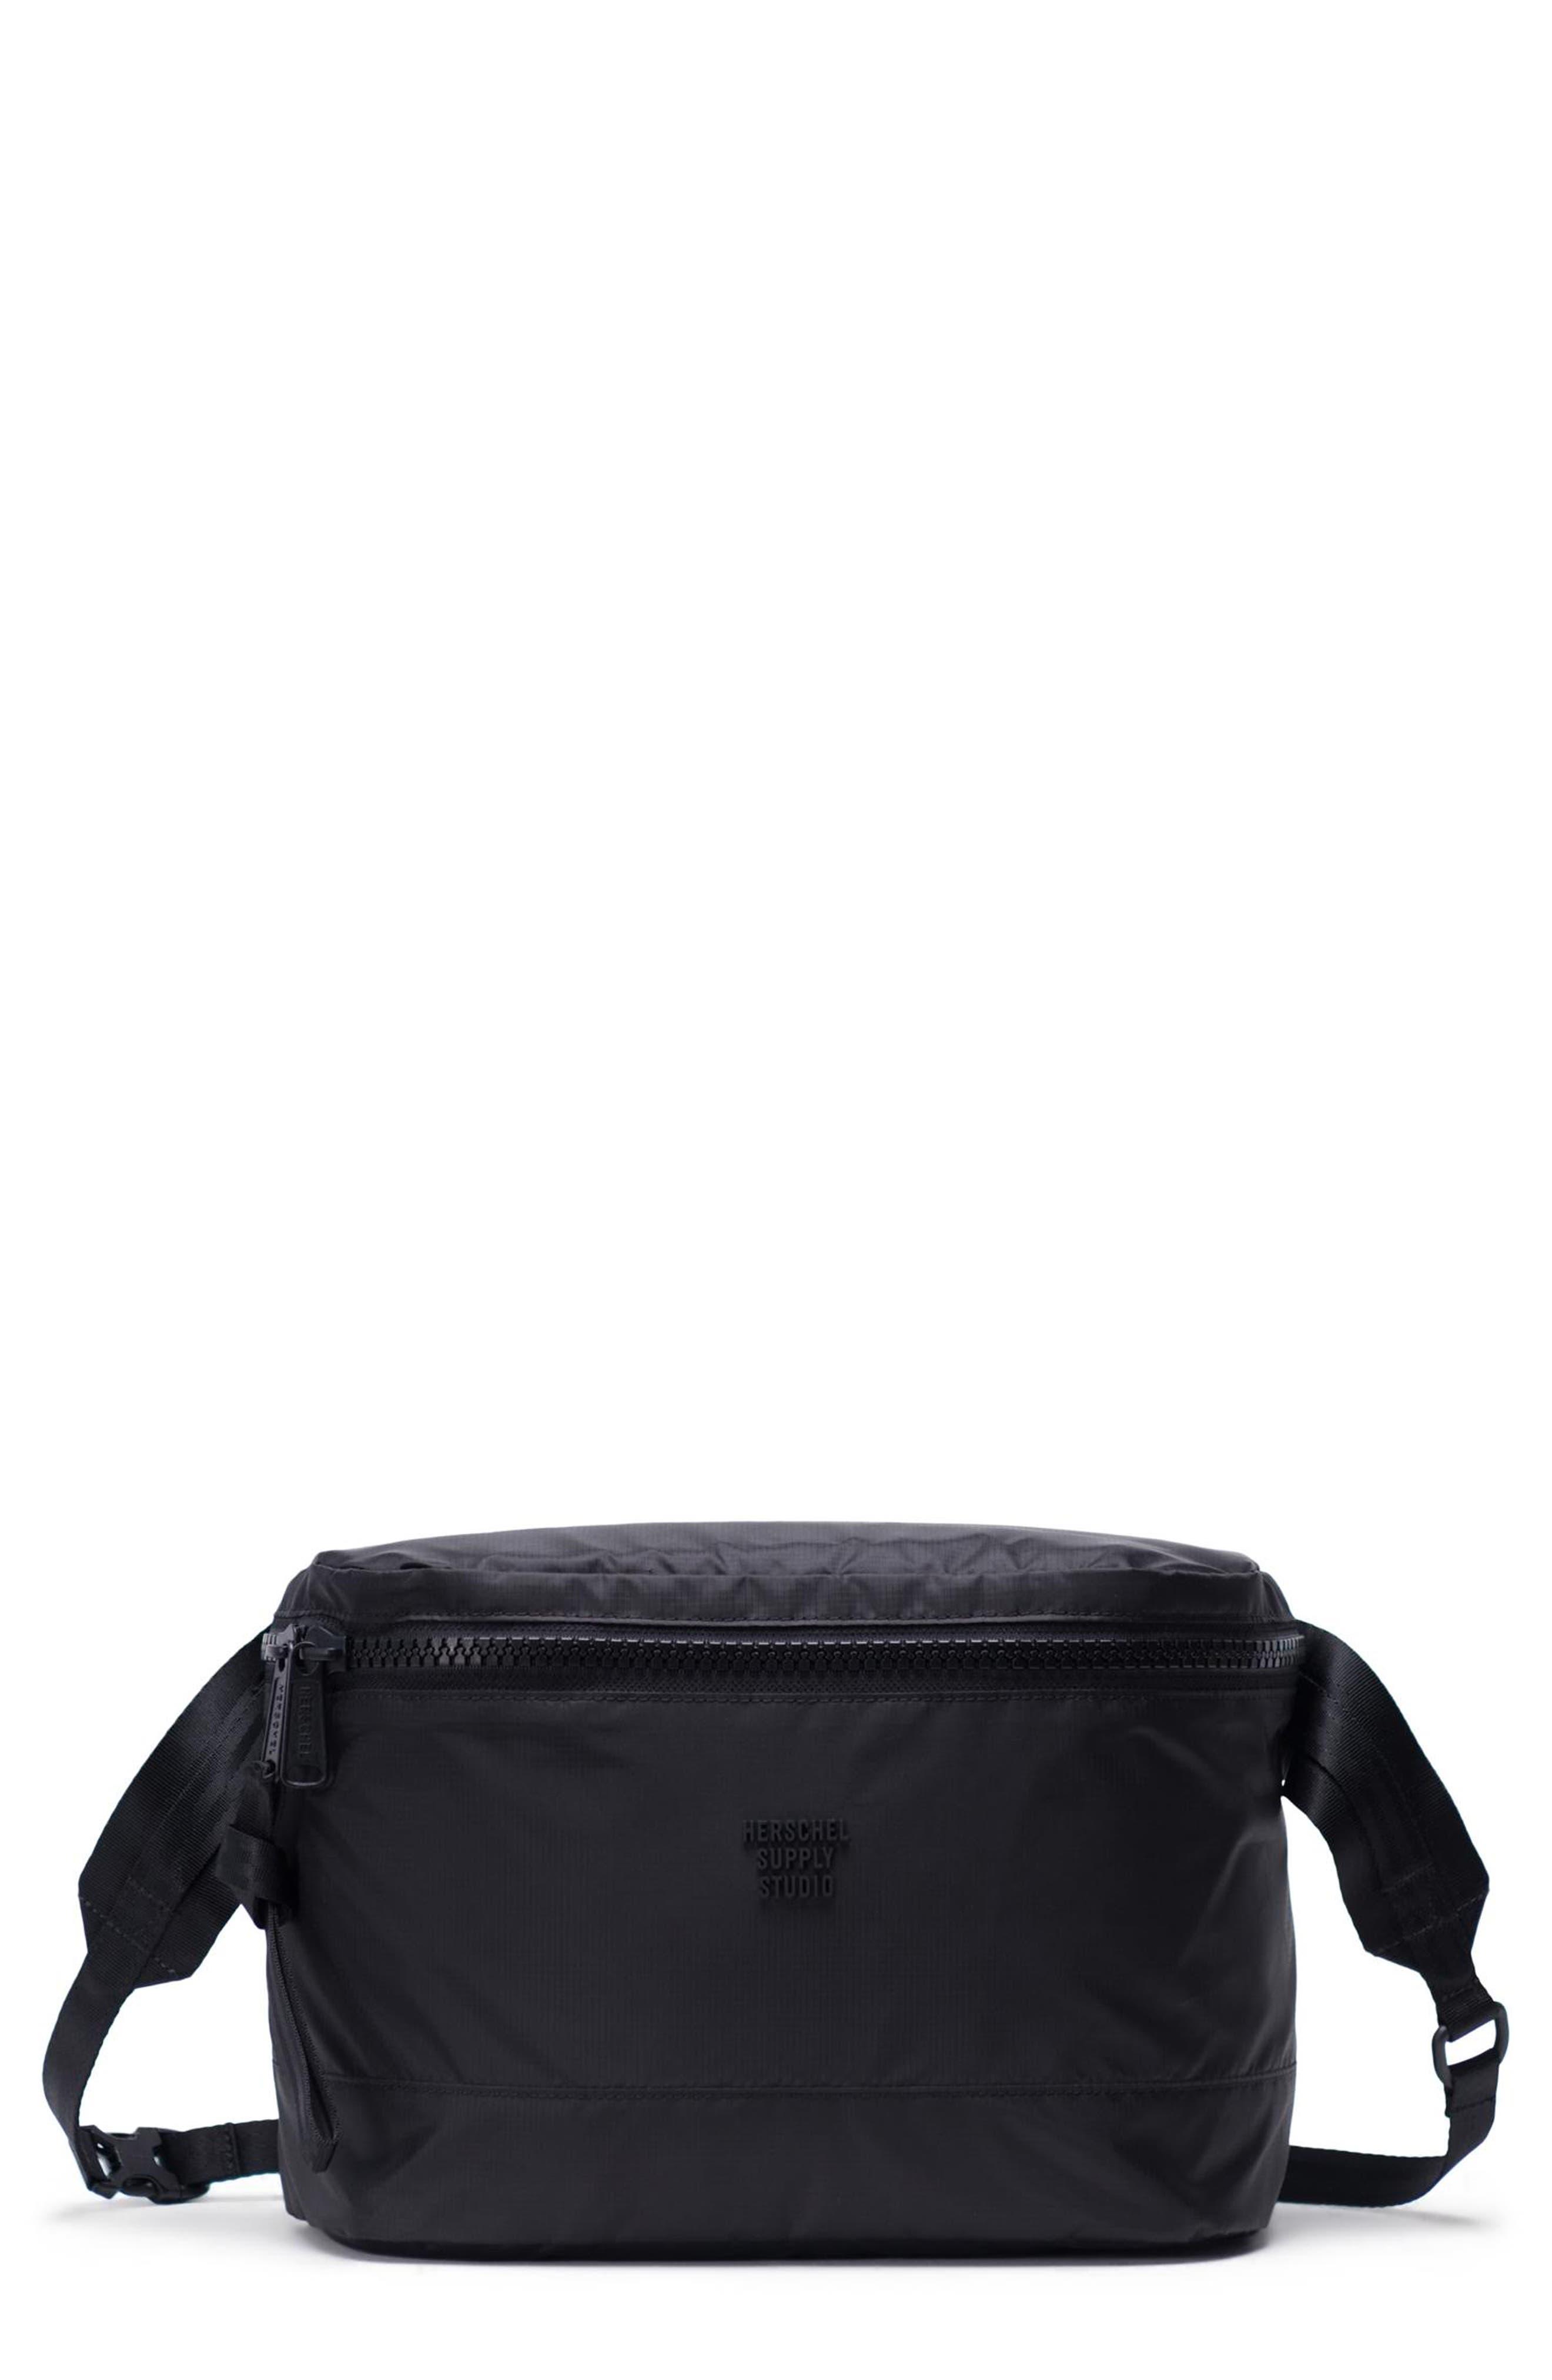 HS9 Studio Collection Hip Pack, Main, color, BLACK